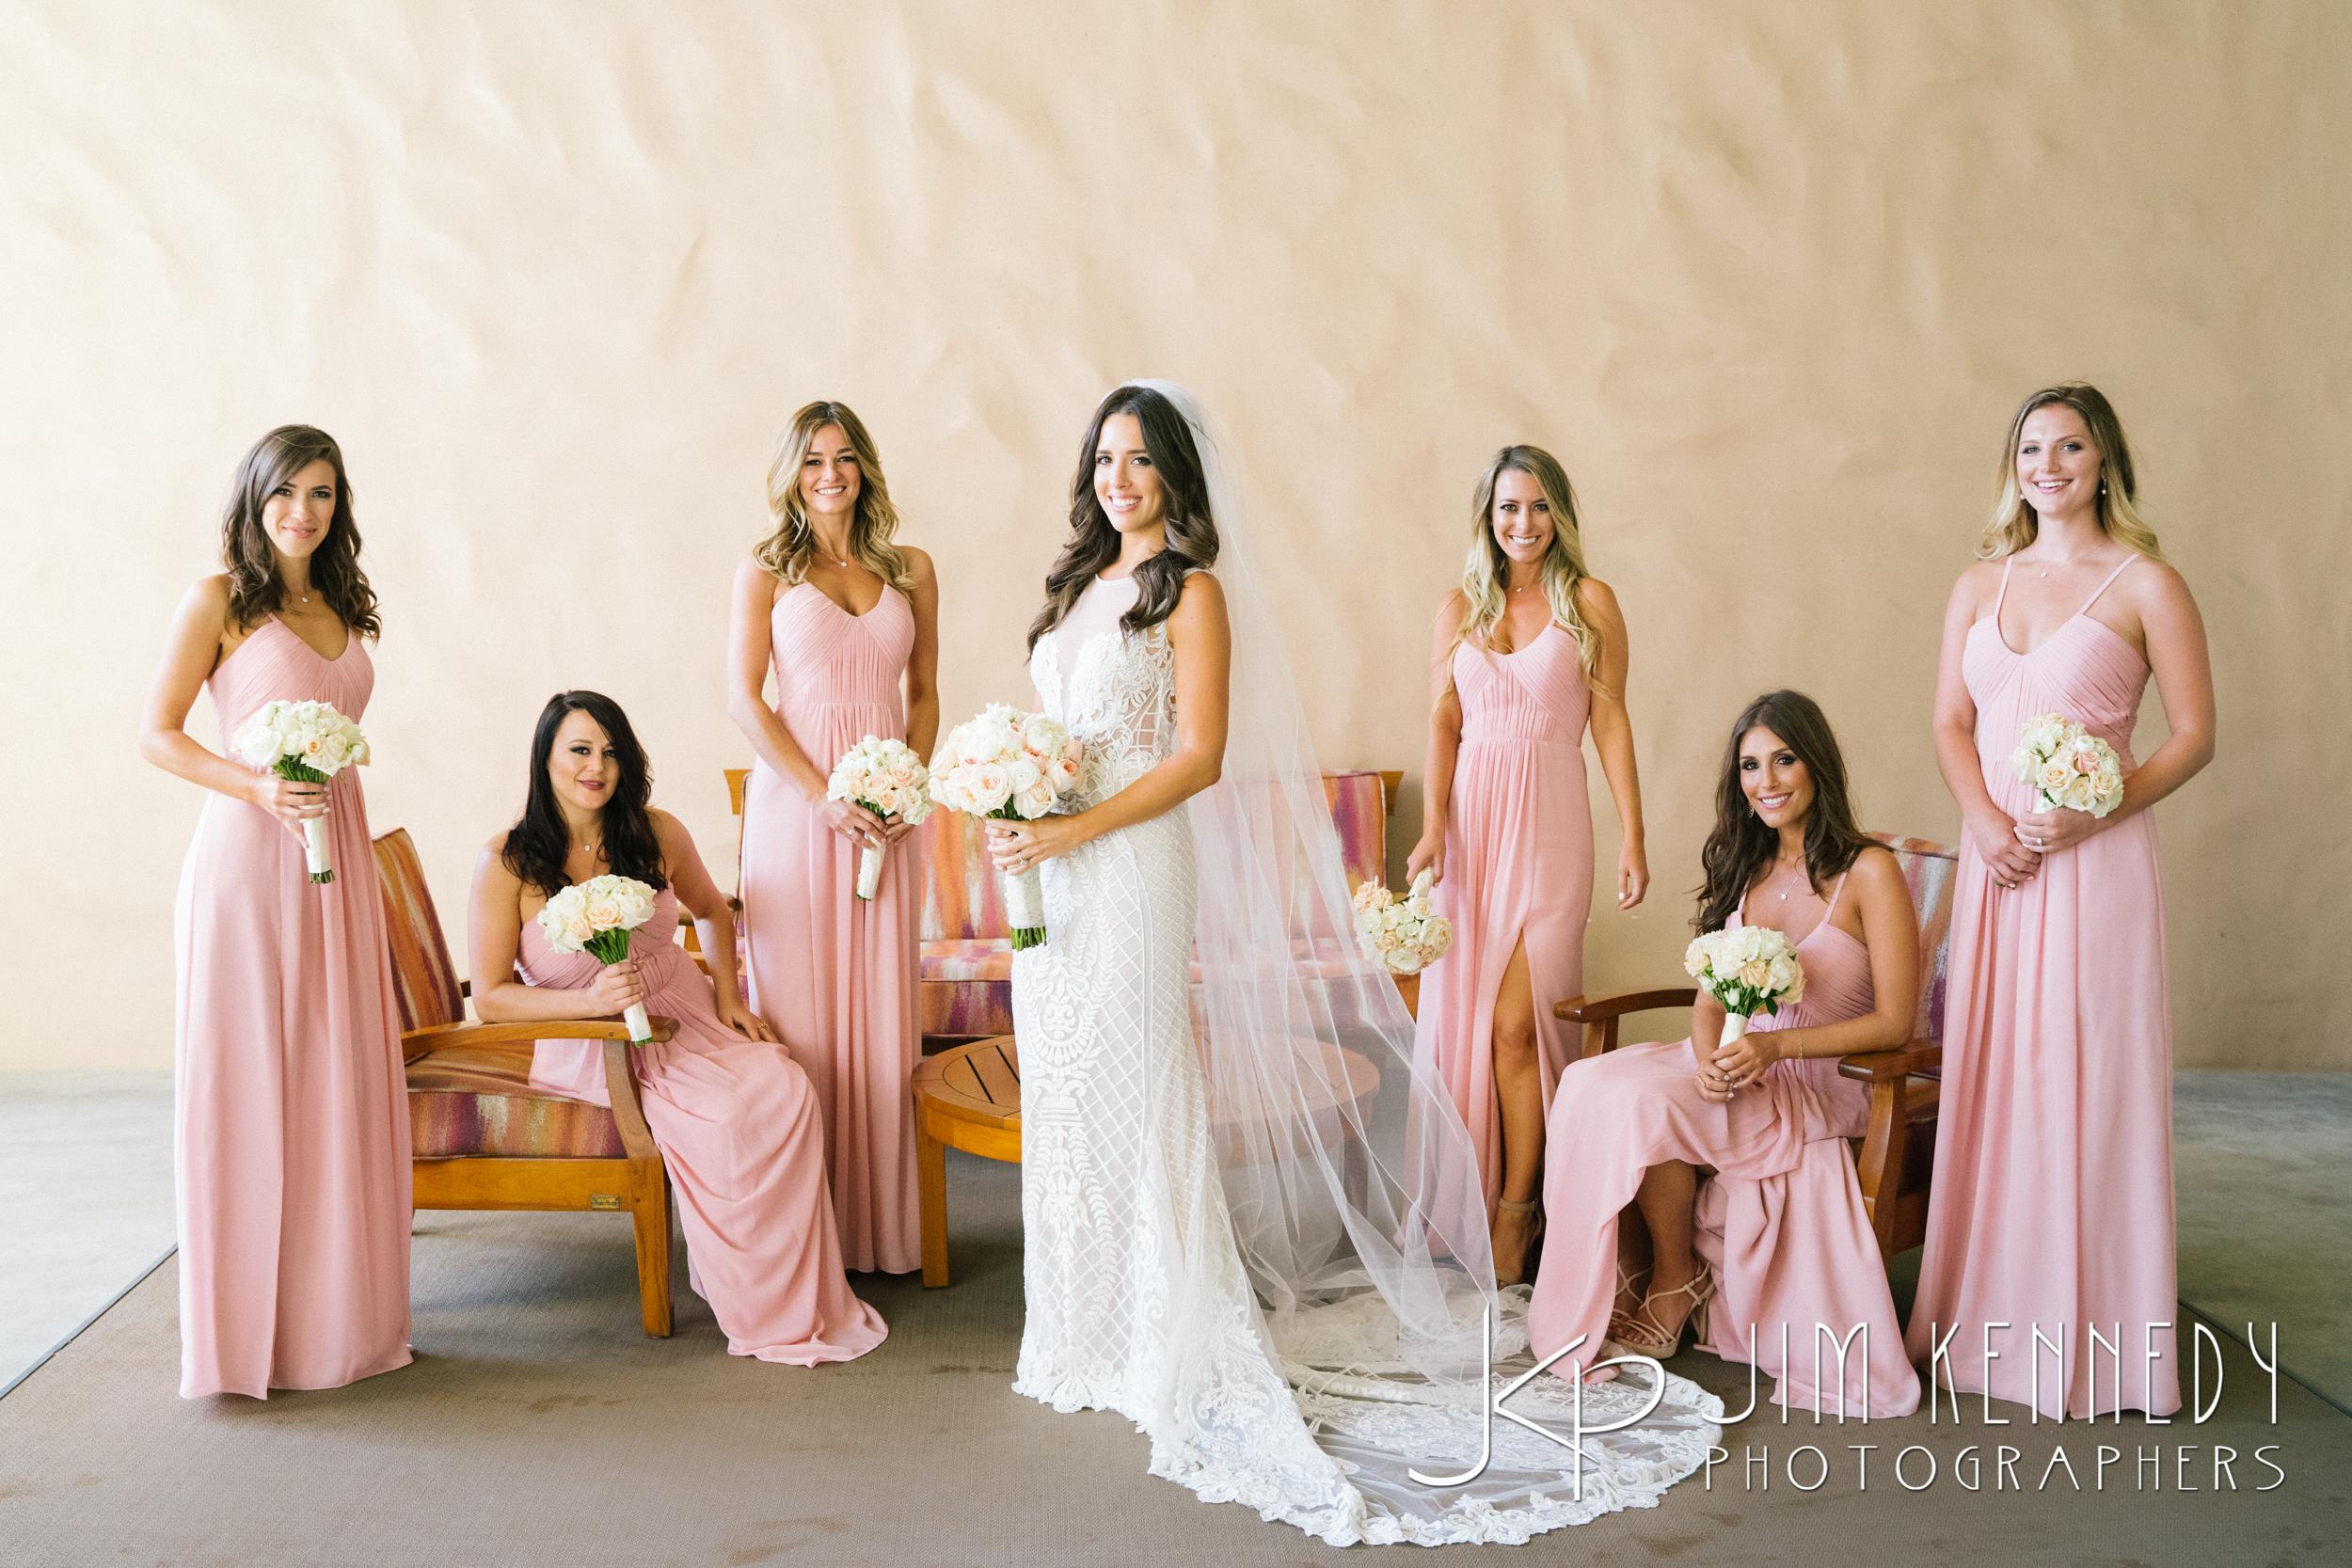 hyatt-huntington-beach-wedding-099.JPG